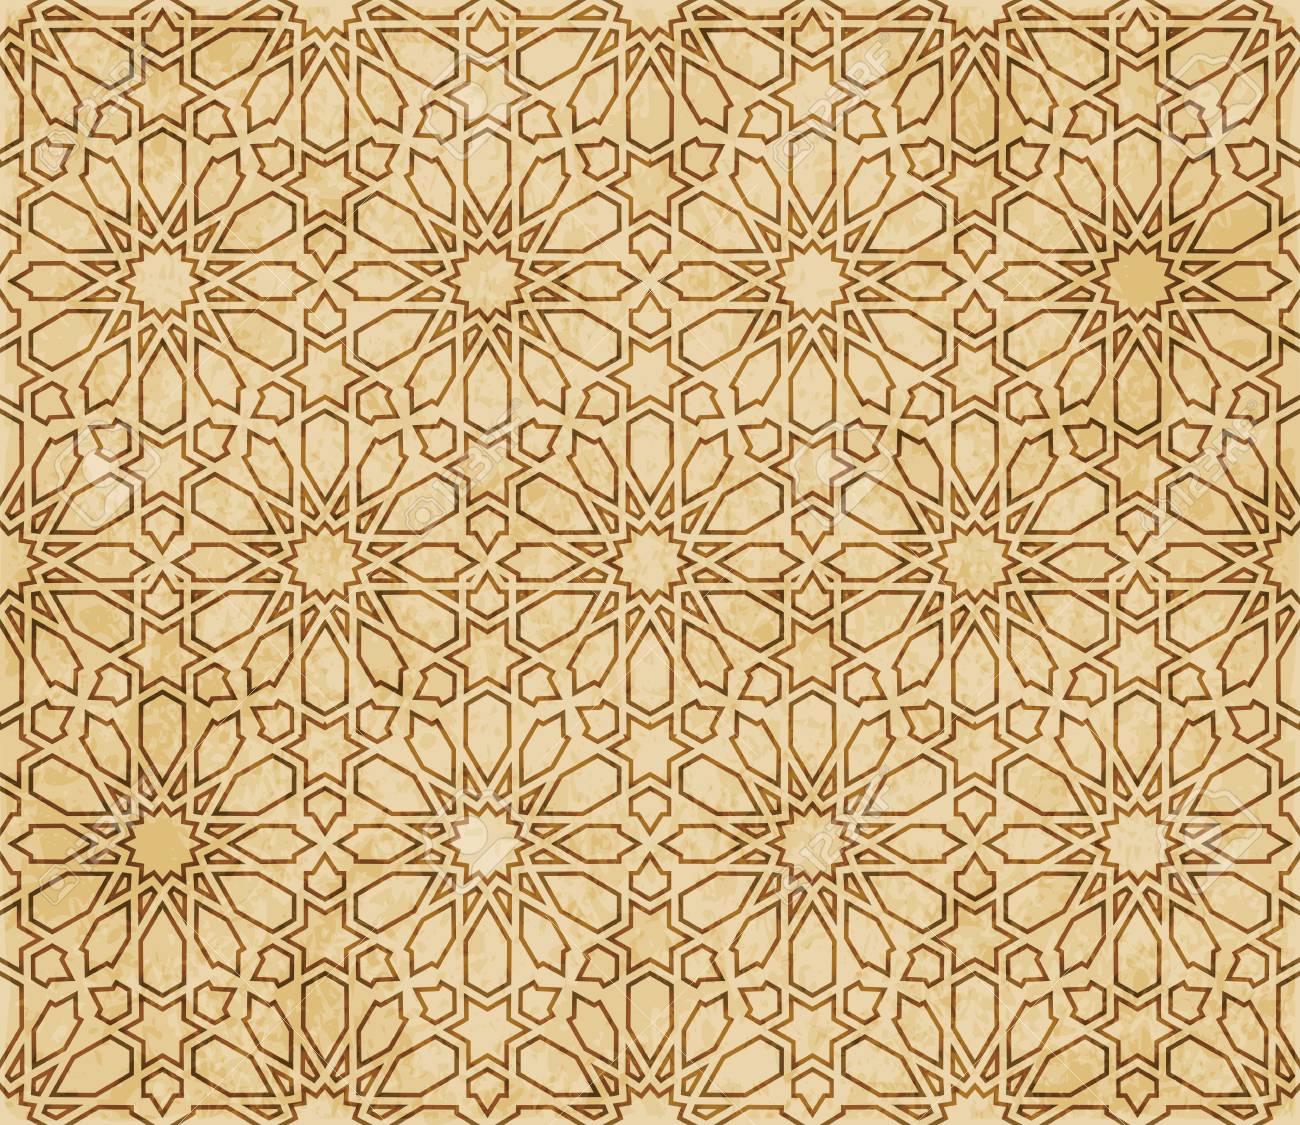 Retro brown Islam seamless geometry pattern background eastern